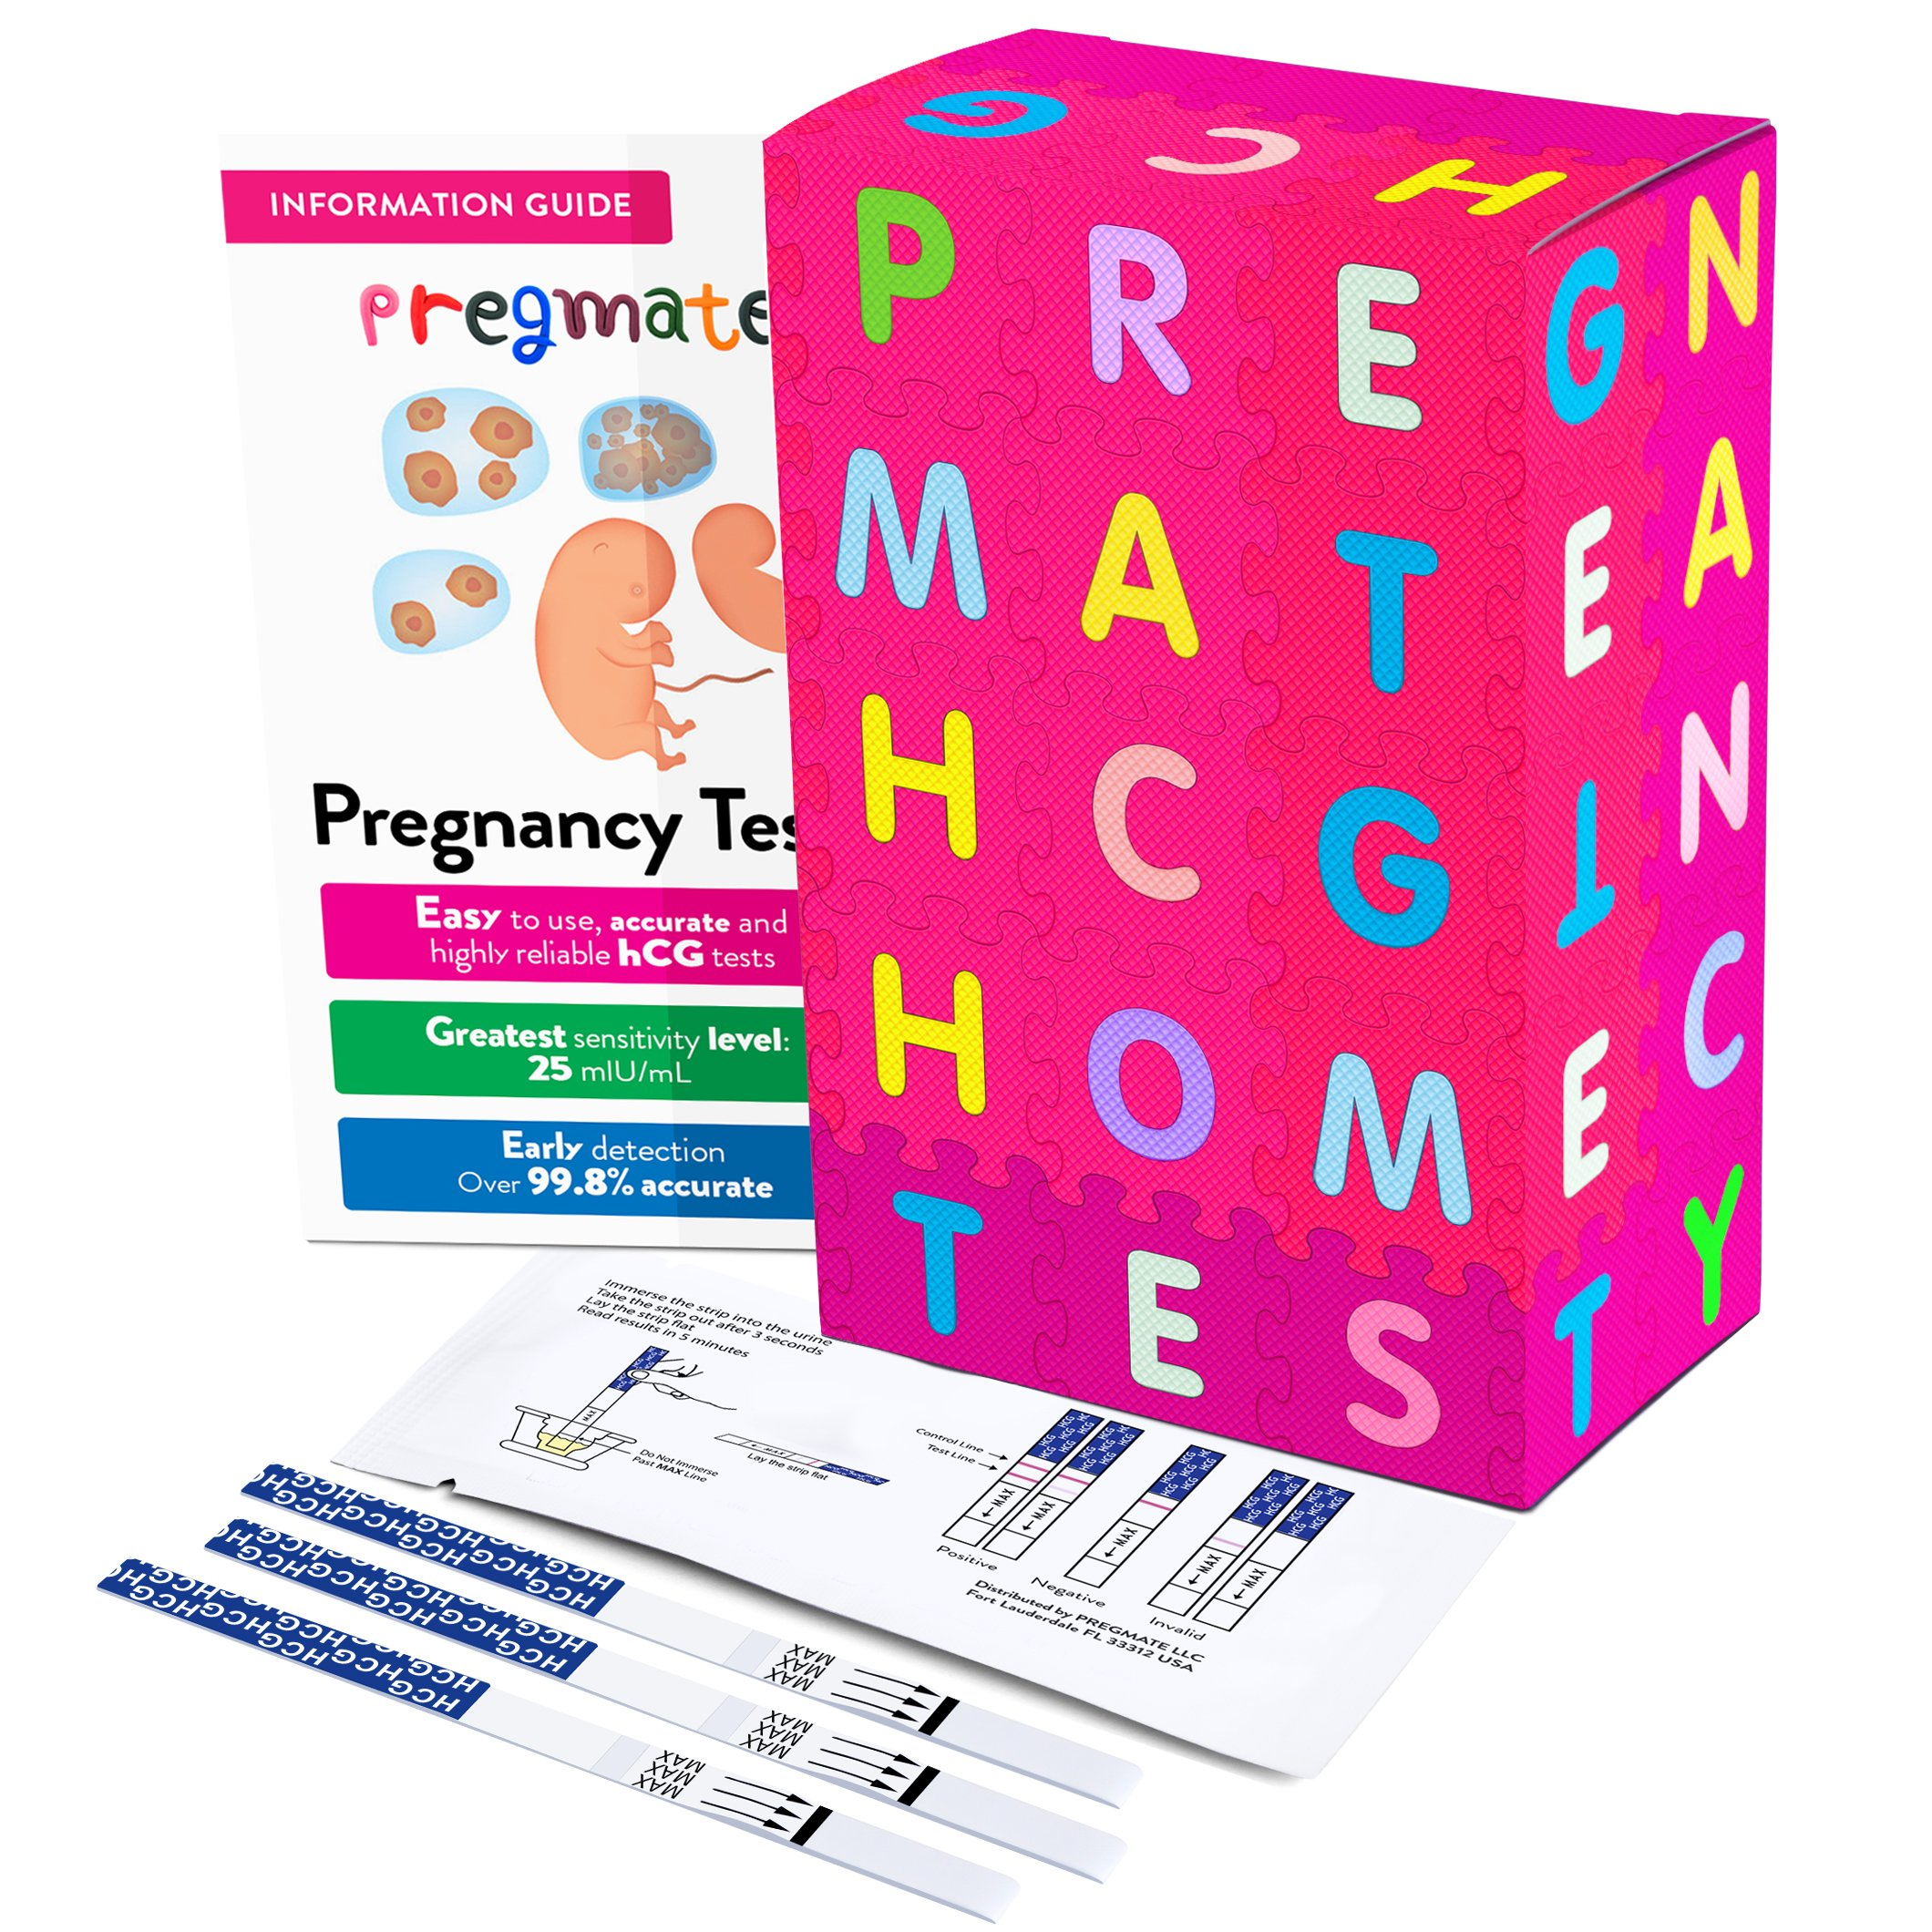 PREGMATE 30 Pregnancy (HCG) Urine Test Strips, 30 HCG Tests